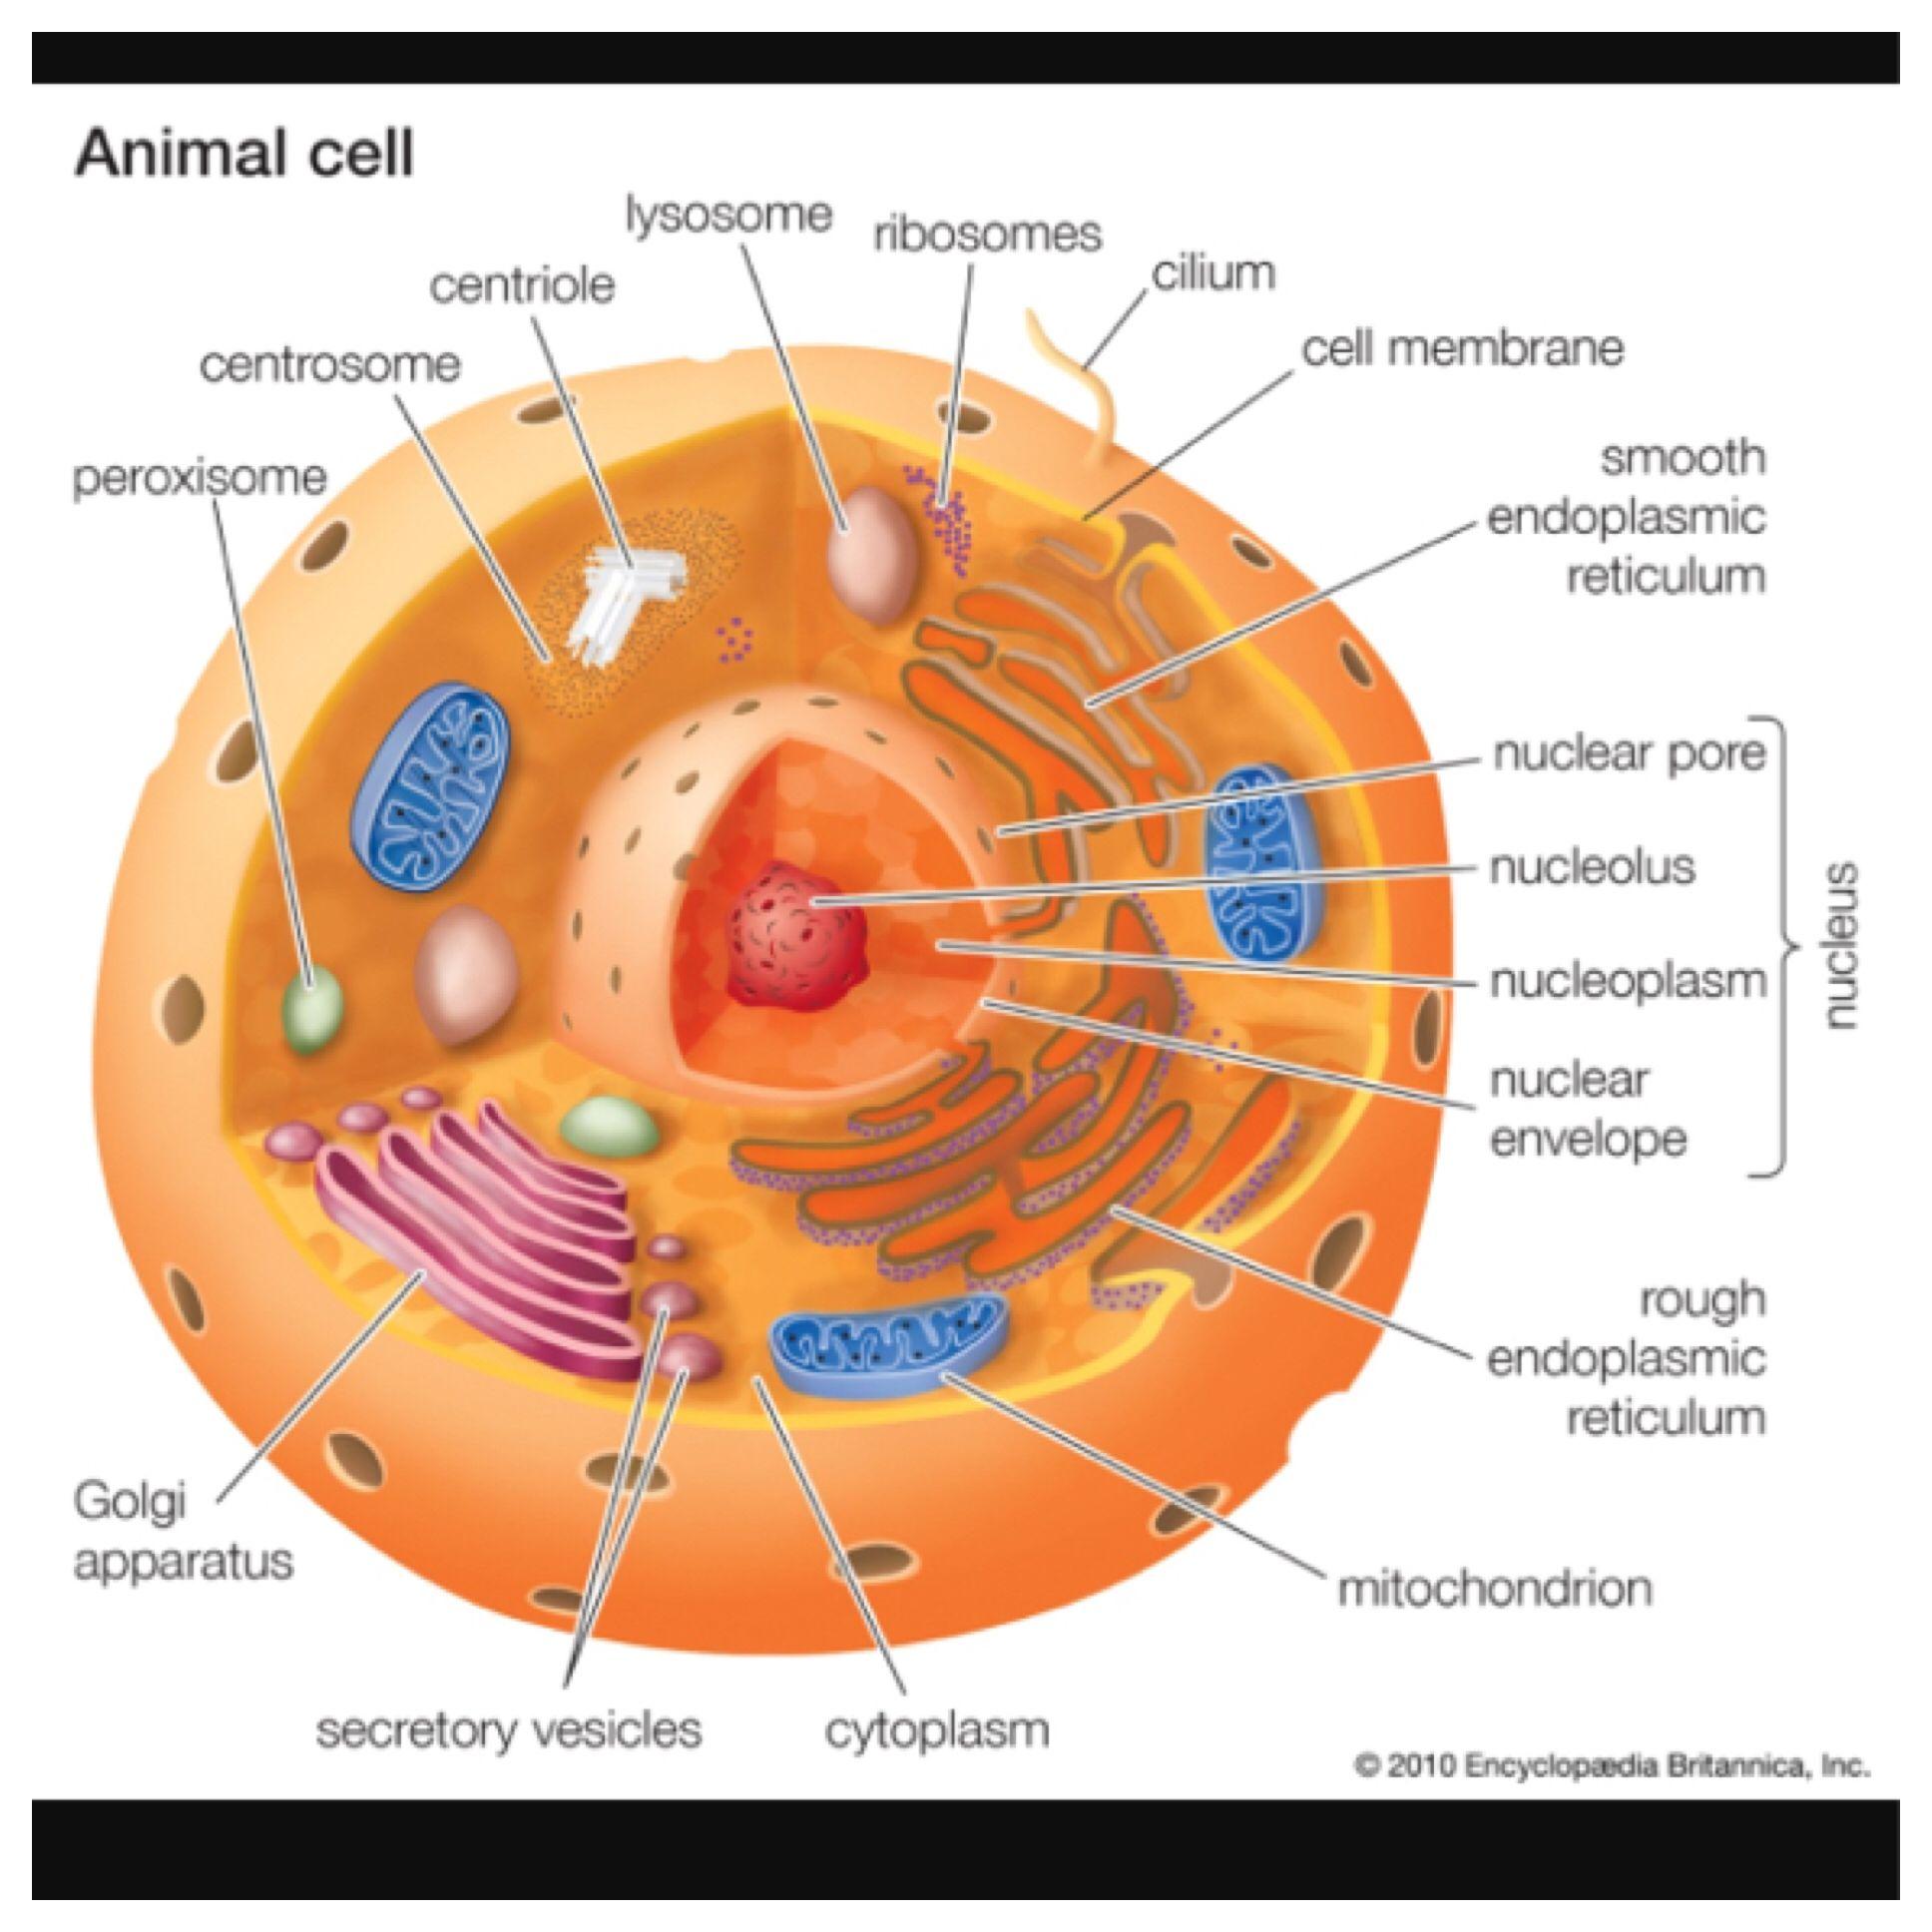 animal cell pilates pinterest cell model and homeschool